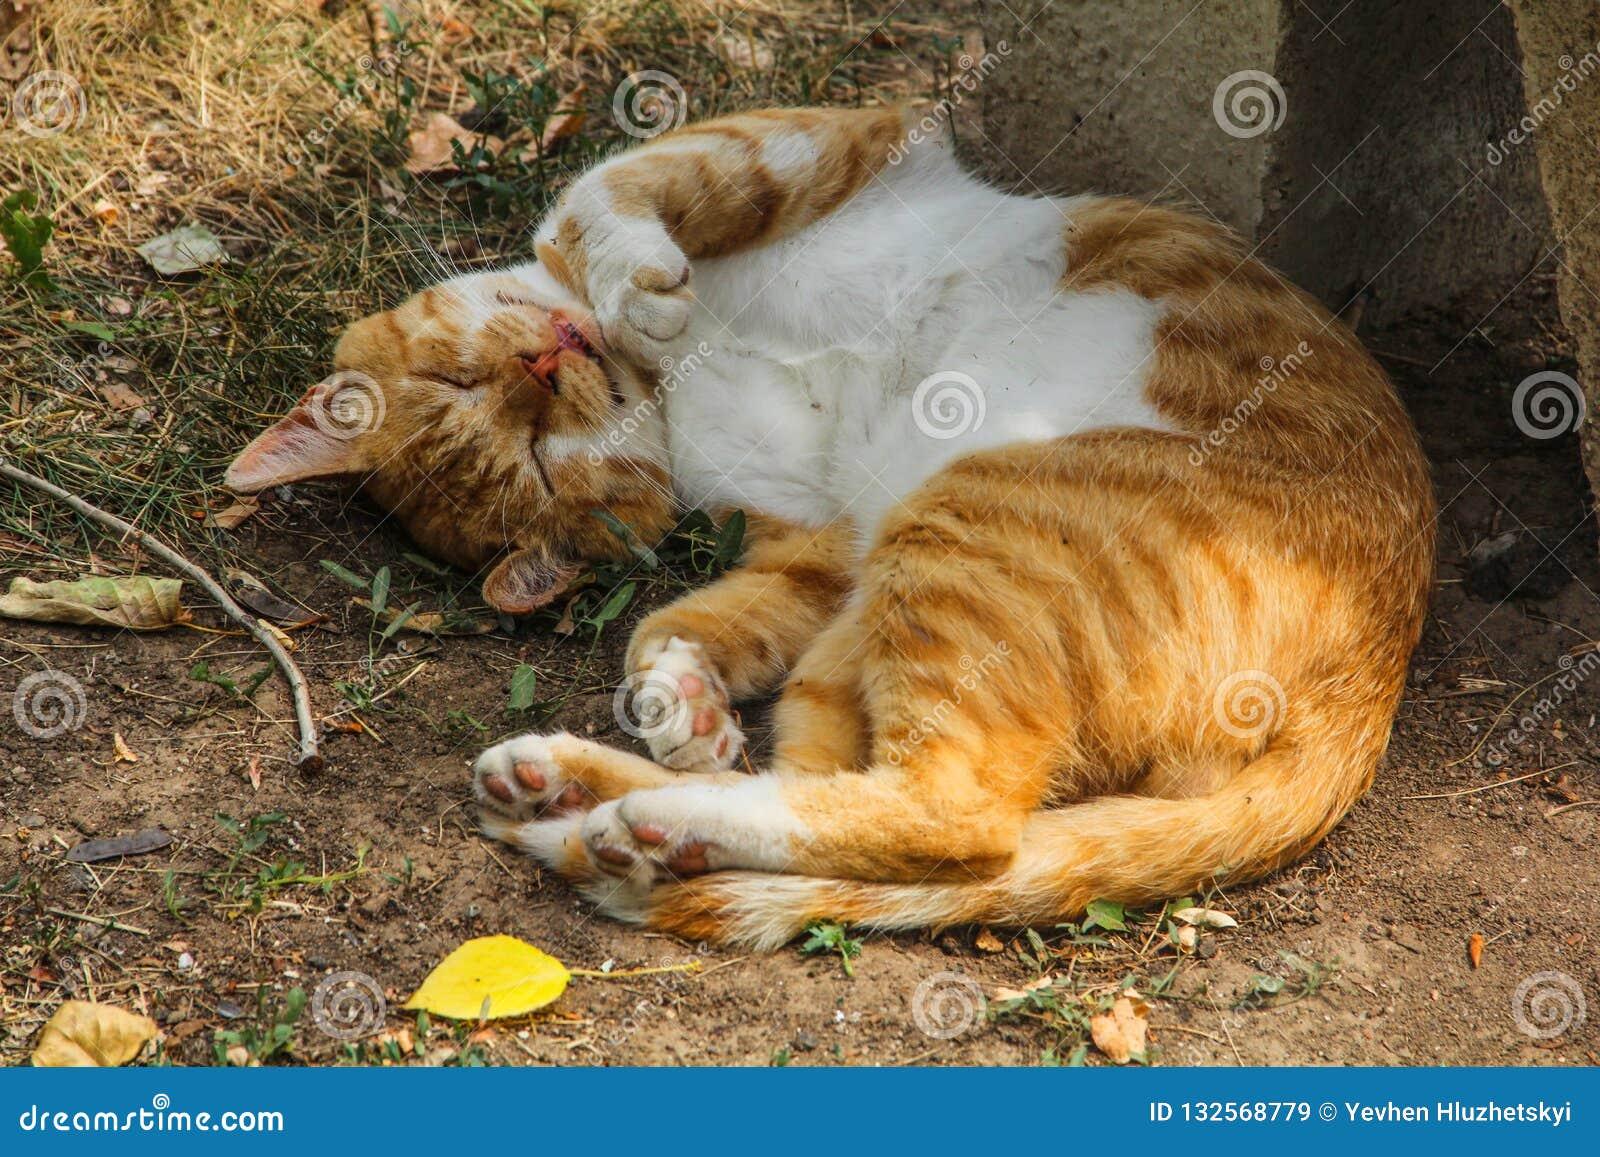 Ginger cat, yard, homeless sleeping in the summer